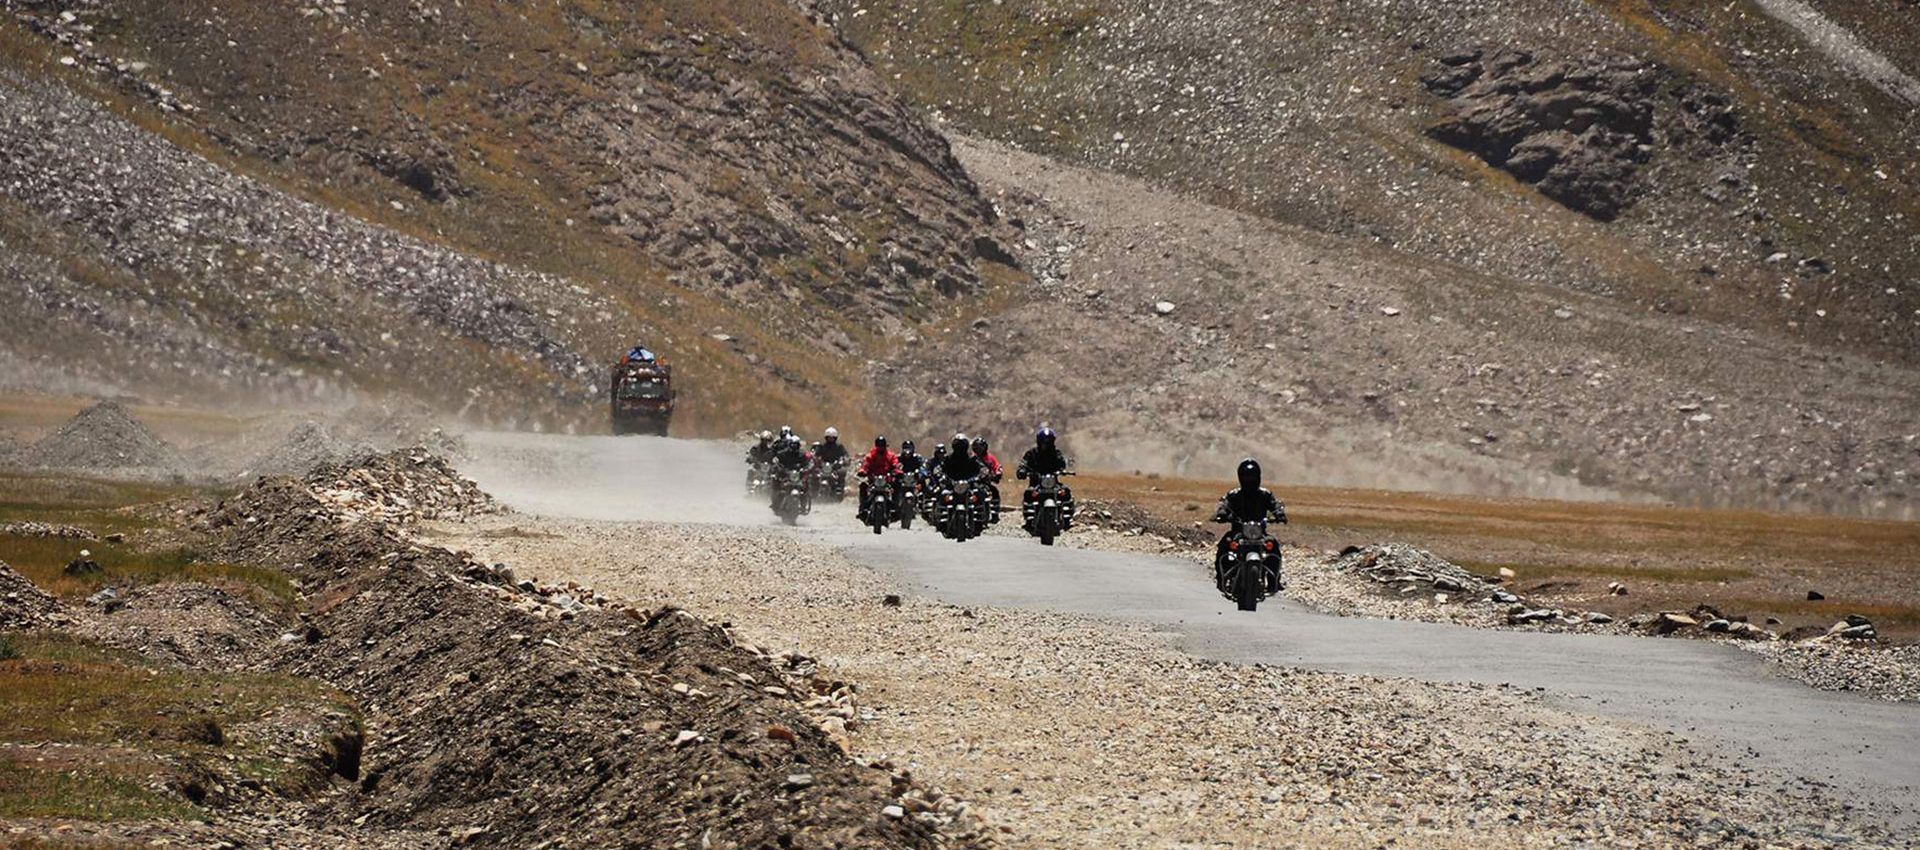 The BTS biker crew riding through the desert of Shyok Valley.